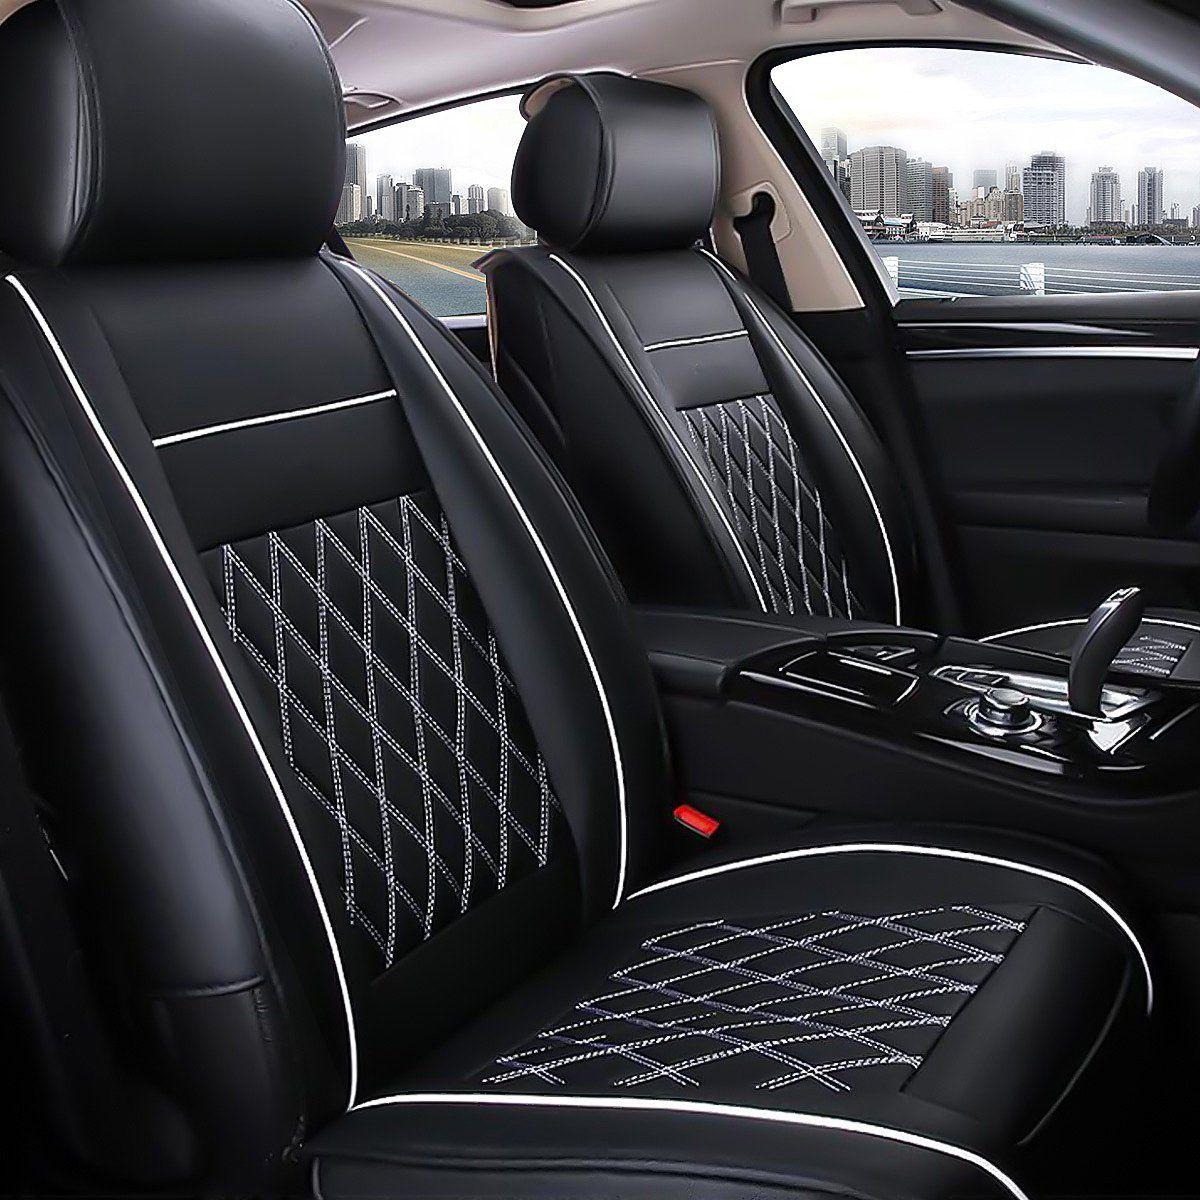 Novashion 7pcs 5 Seat Cover Urethane Leather Front Rear Cushion Pad Armrest For Car Walmart Com In 2021 Leather Car Seats Leather Car Seat Covers Car Seats